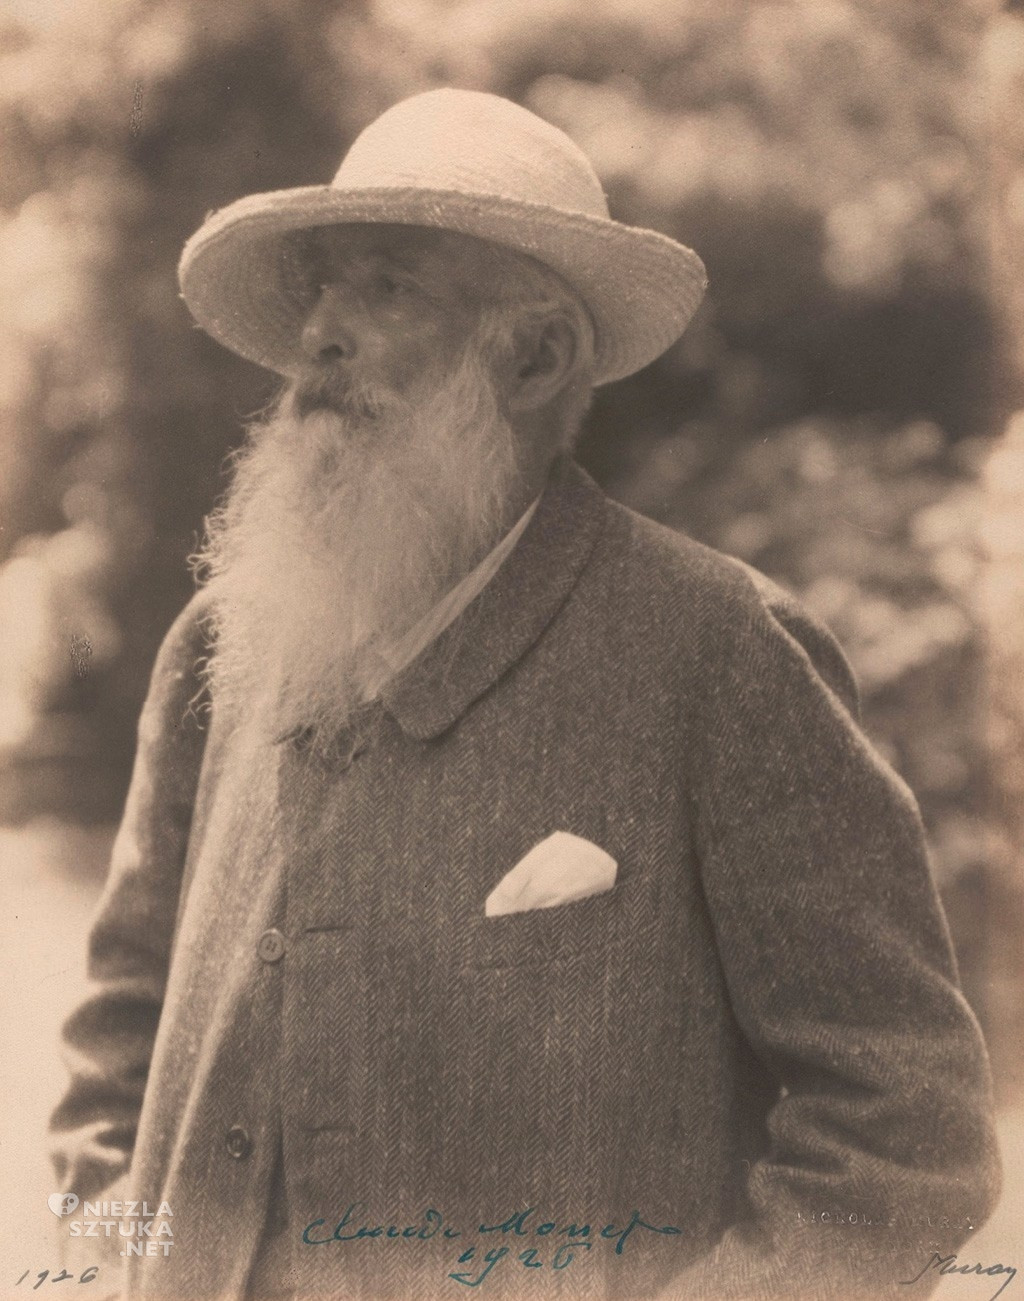 Claude Monet | 1926, fot. Nickolas Muray, moma.org